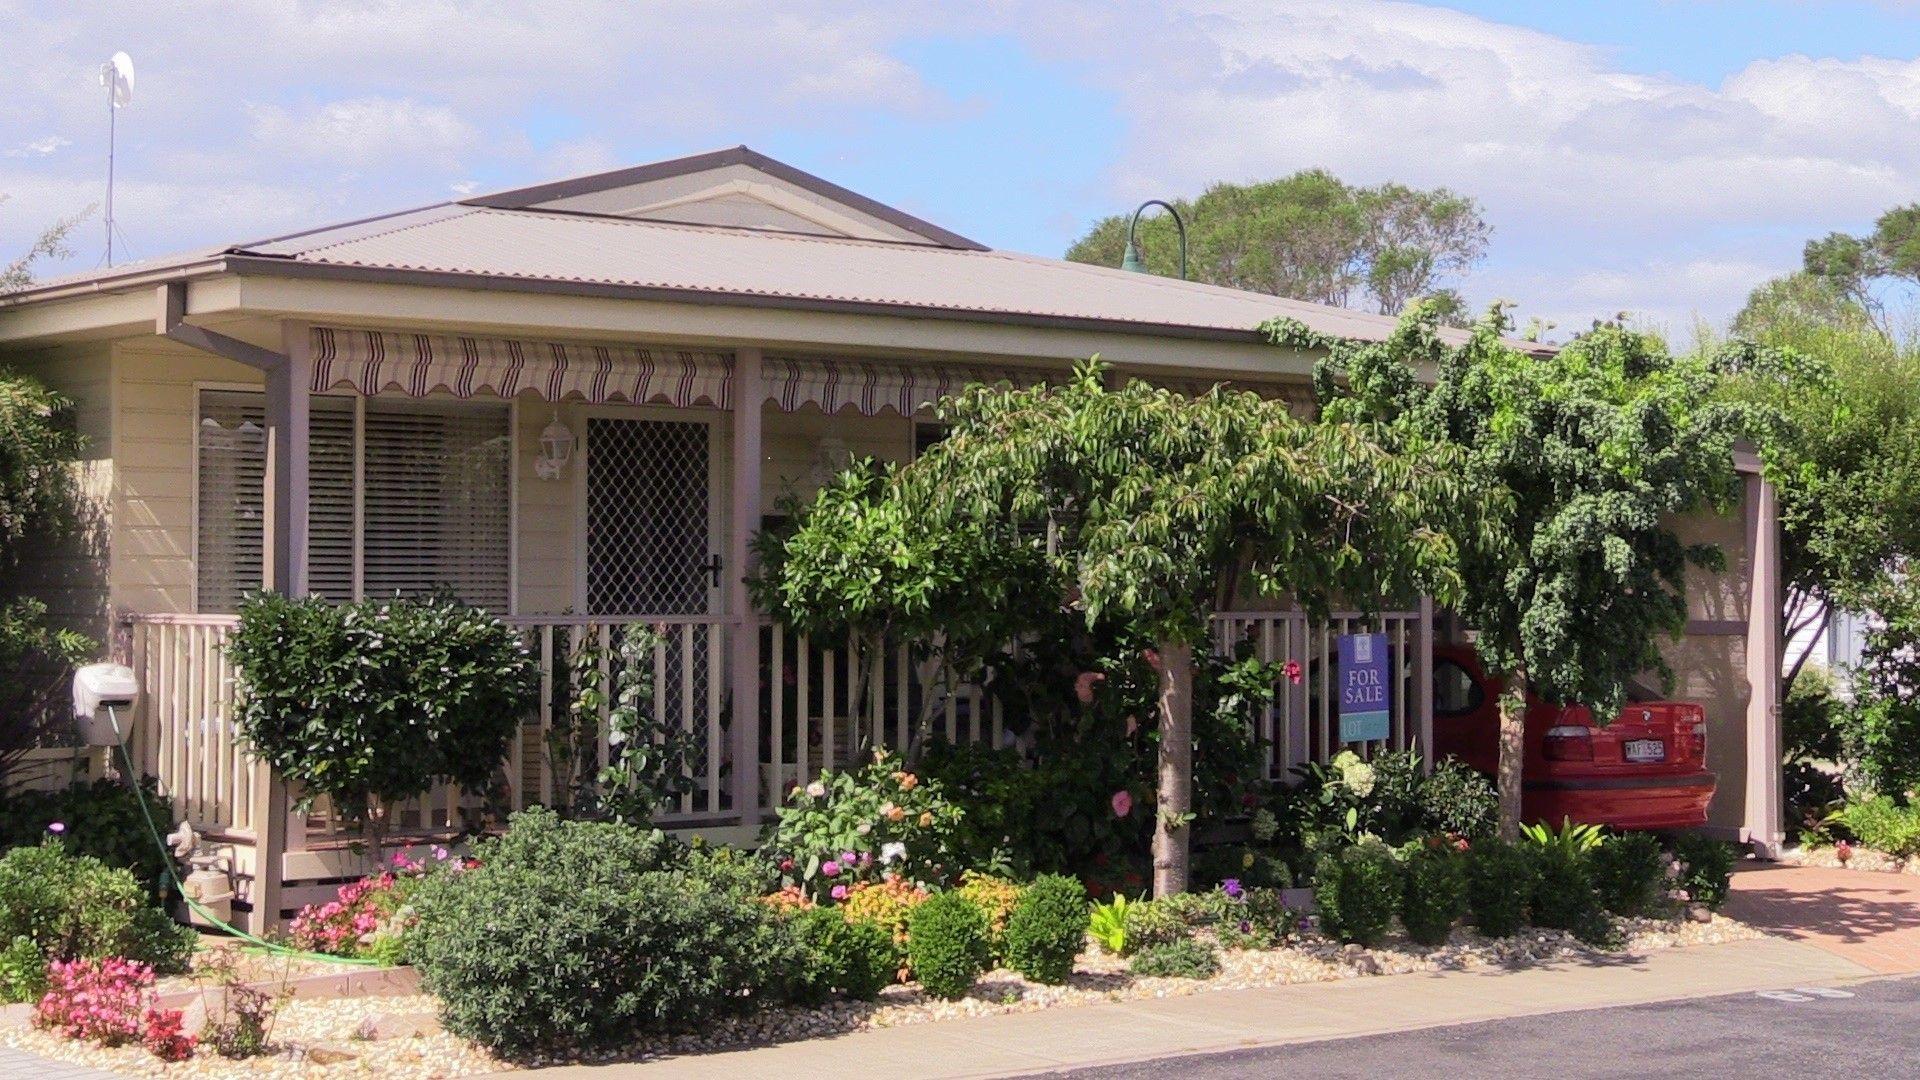 69/3197 Princes Highway, Pambula NSW 2549, Image 0